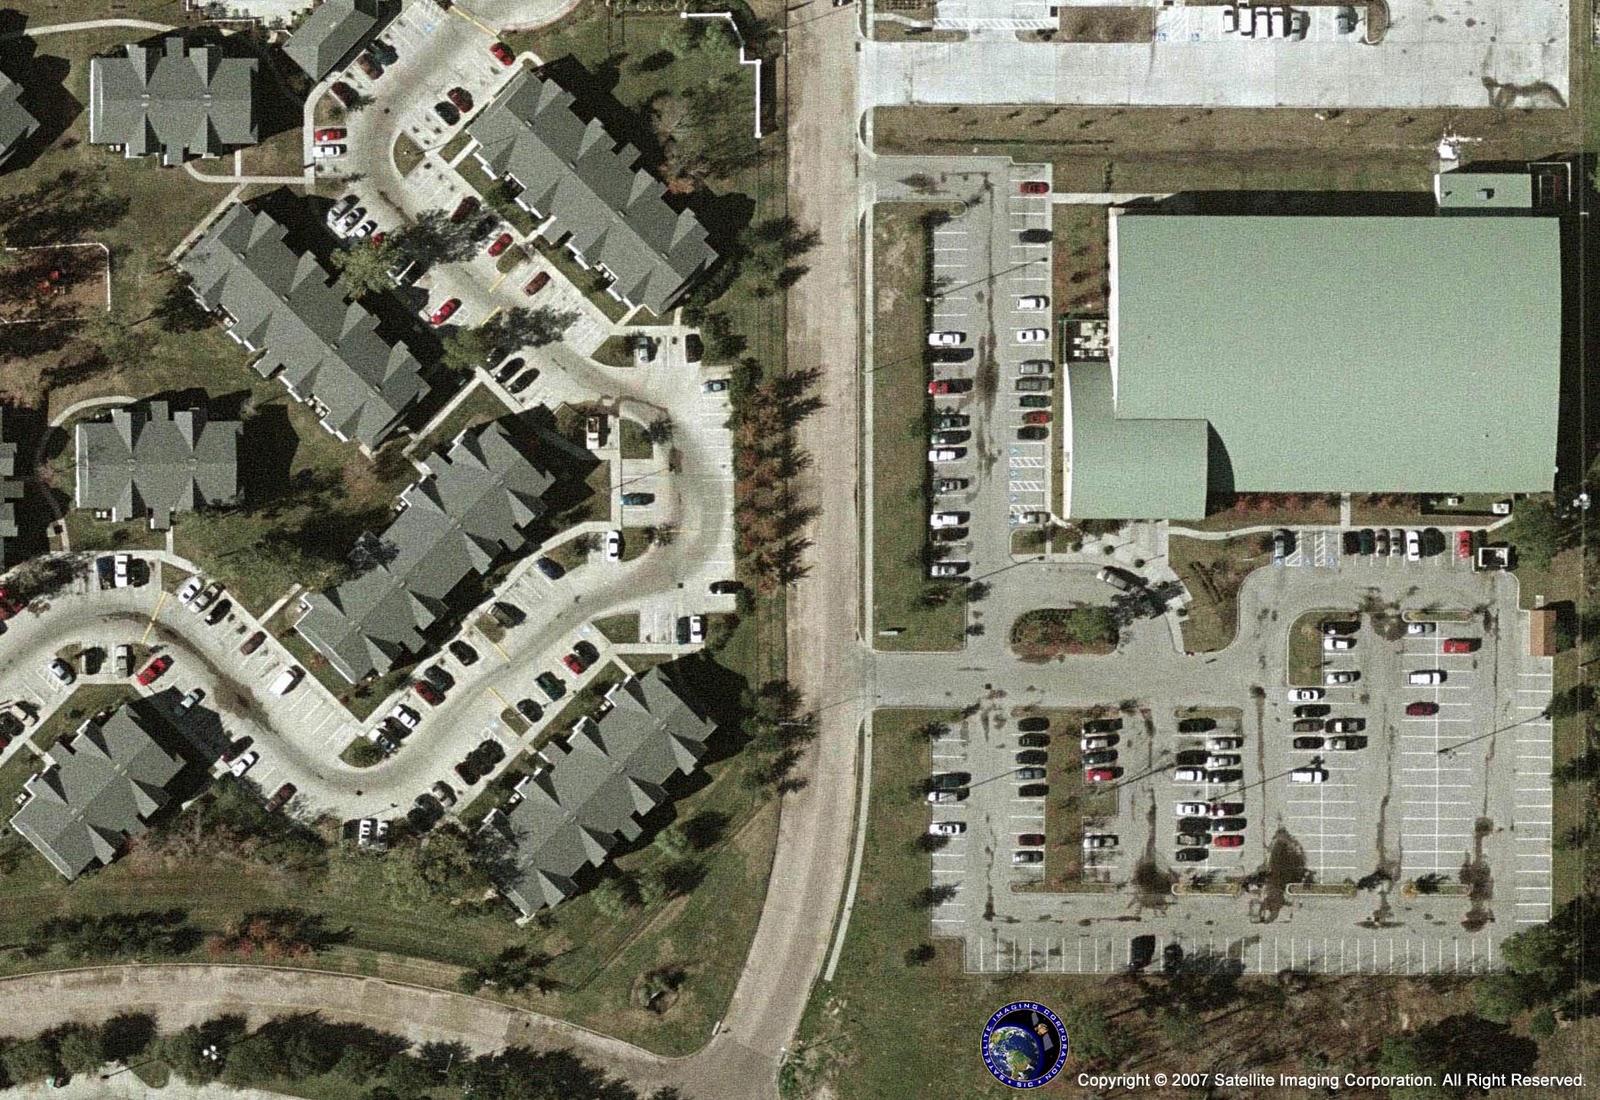 Maps - High resolution aerial maps